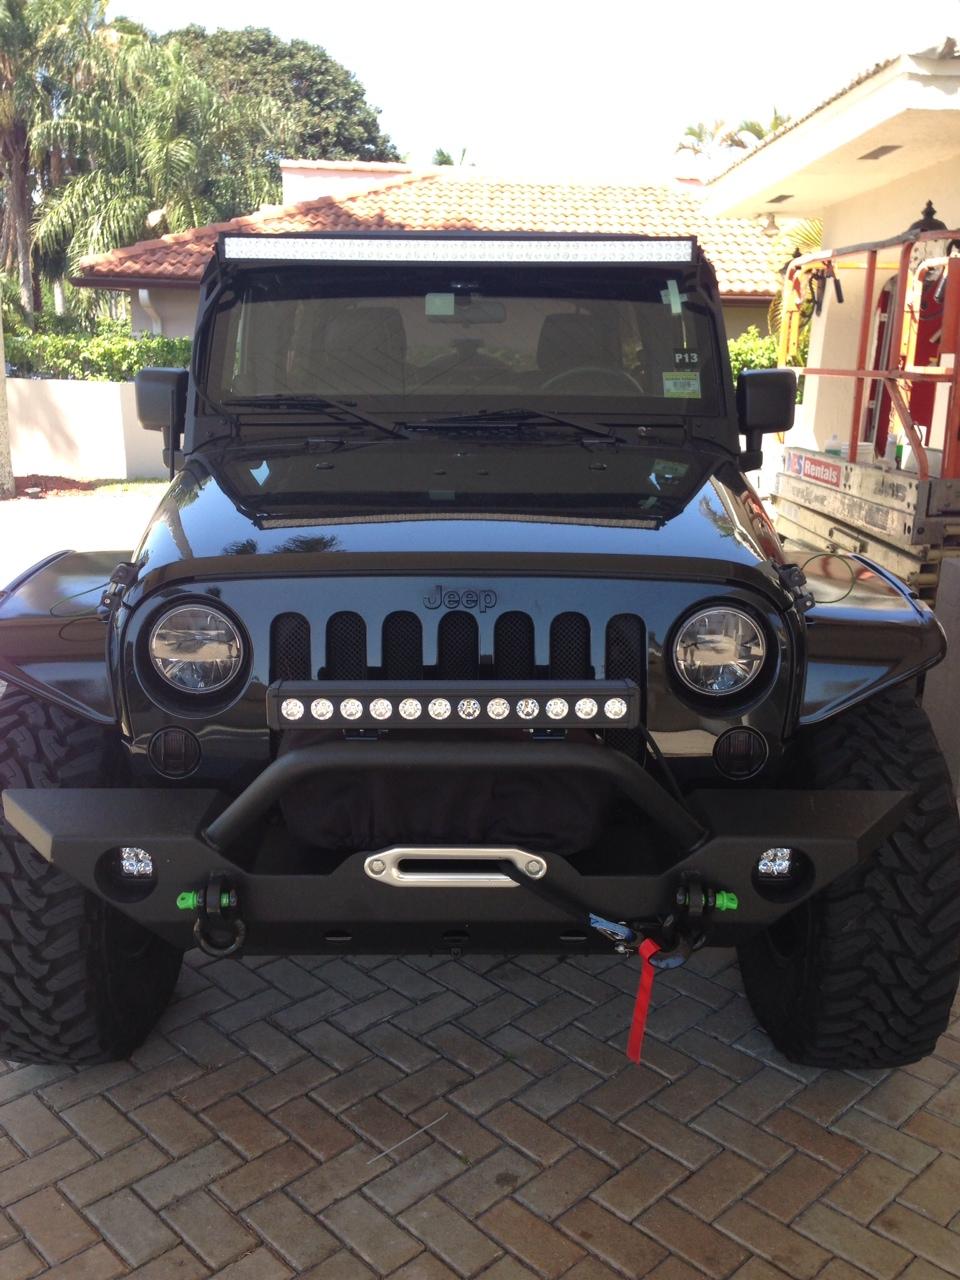 chinese light bars - jkowners : jeep wrangler jk forum